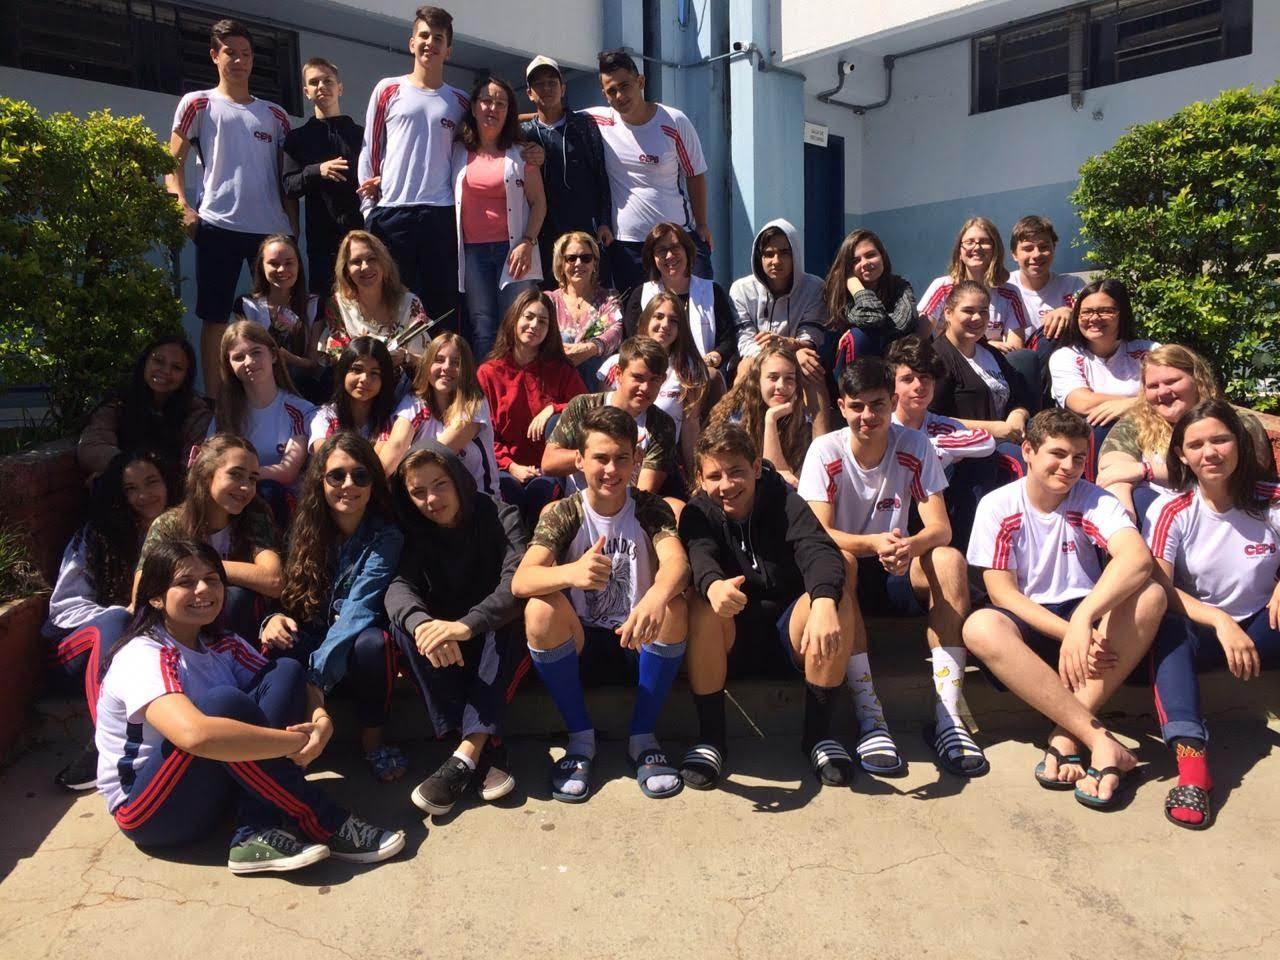 Jovens reunidos na escola